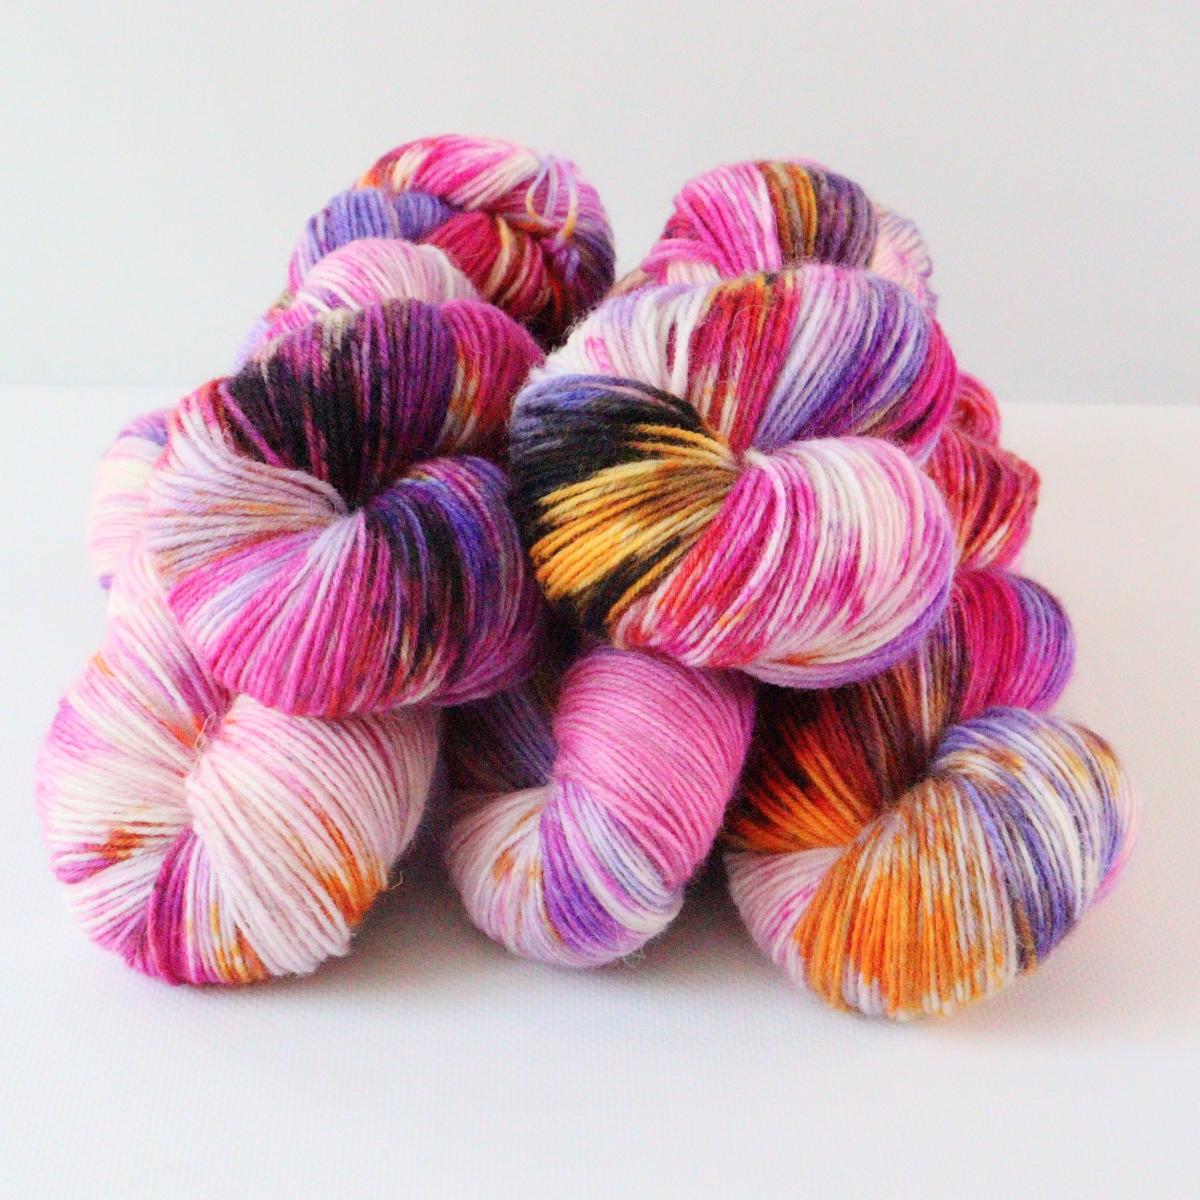 woodico.pro hand dyed yarn 084 1200x1200 - Hand dyed yarn / 084